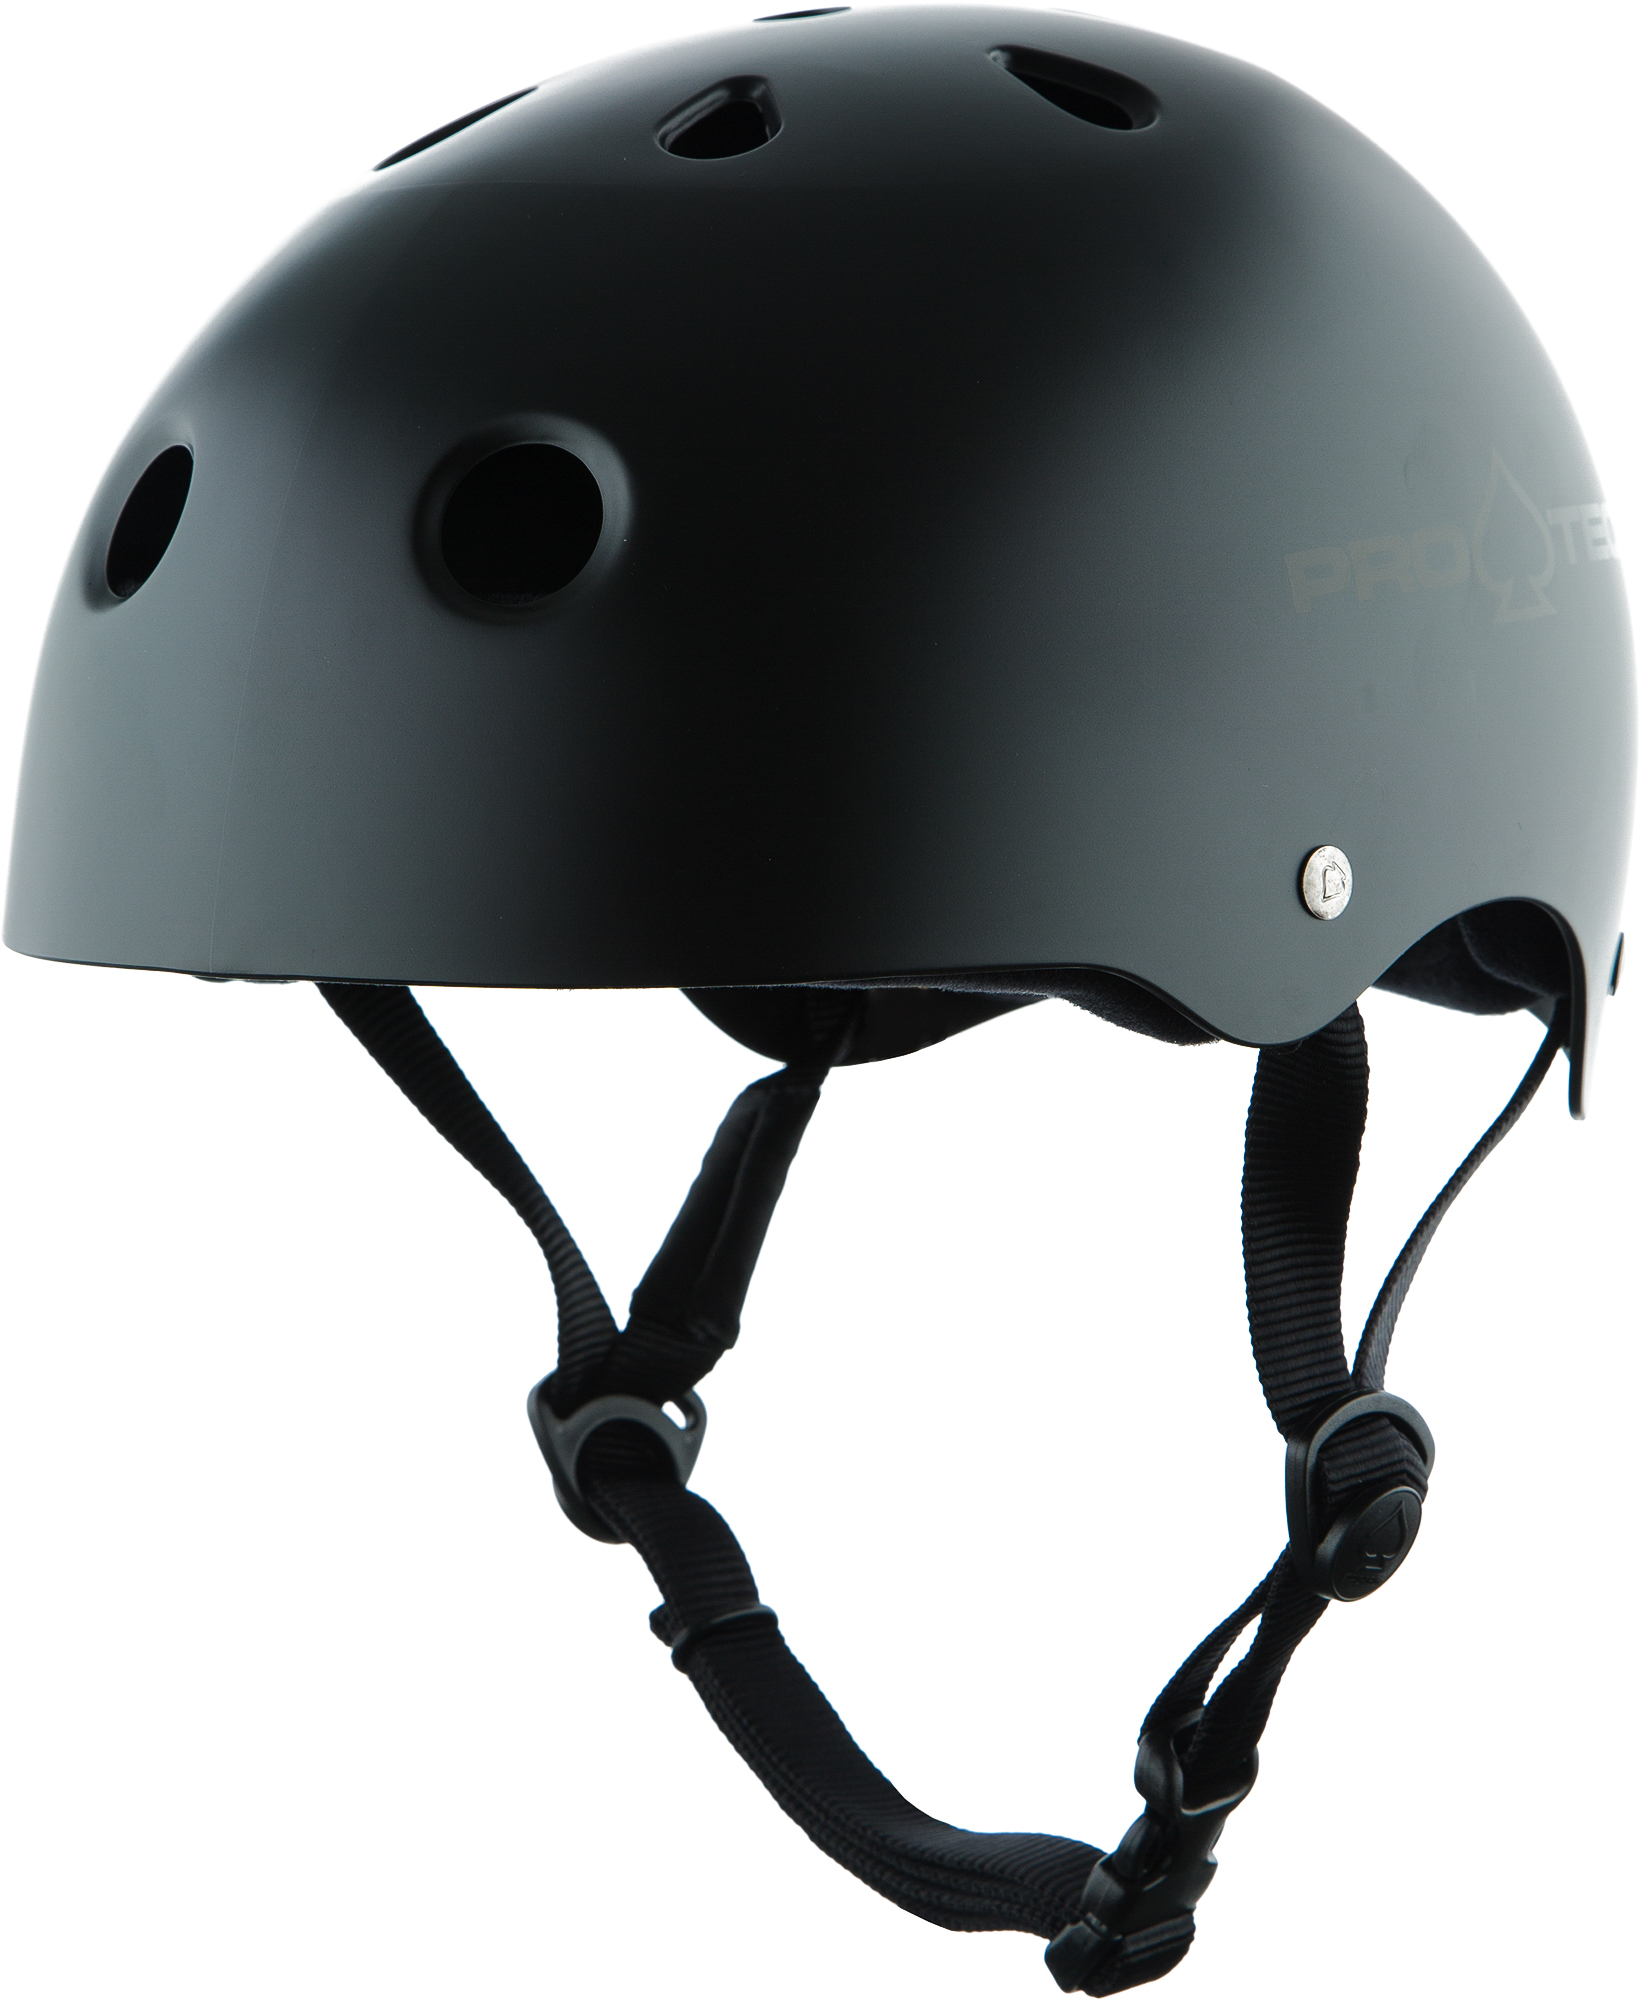 Pro-Tec Шлем Pro-Tec Classic недорго, оригинальная цена